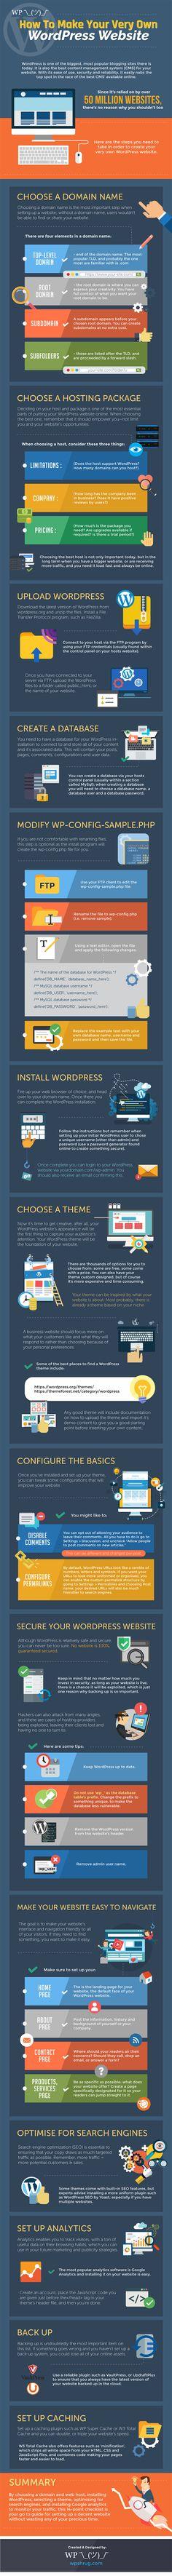 DIY Web Design: How to make your own WordPress Website